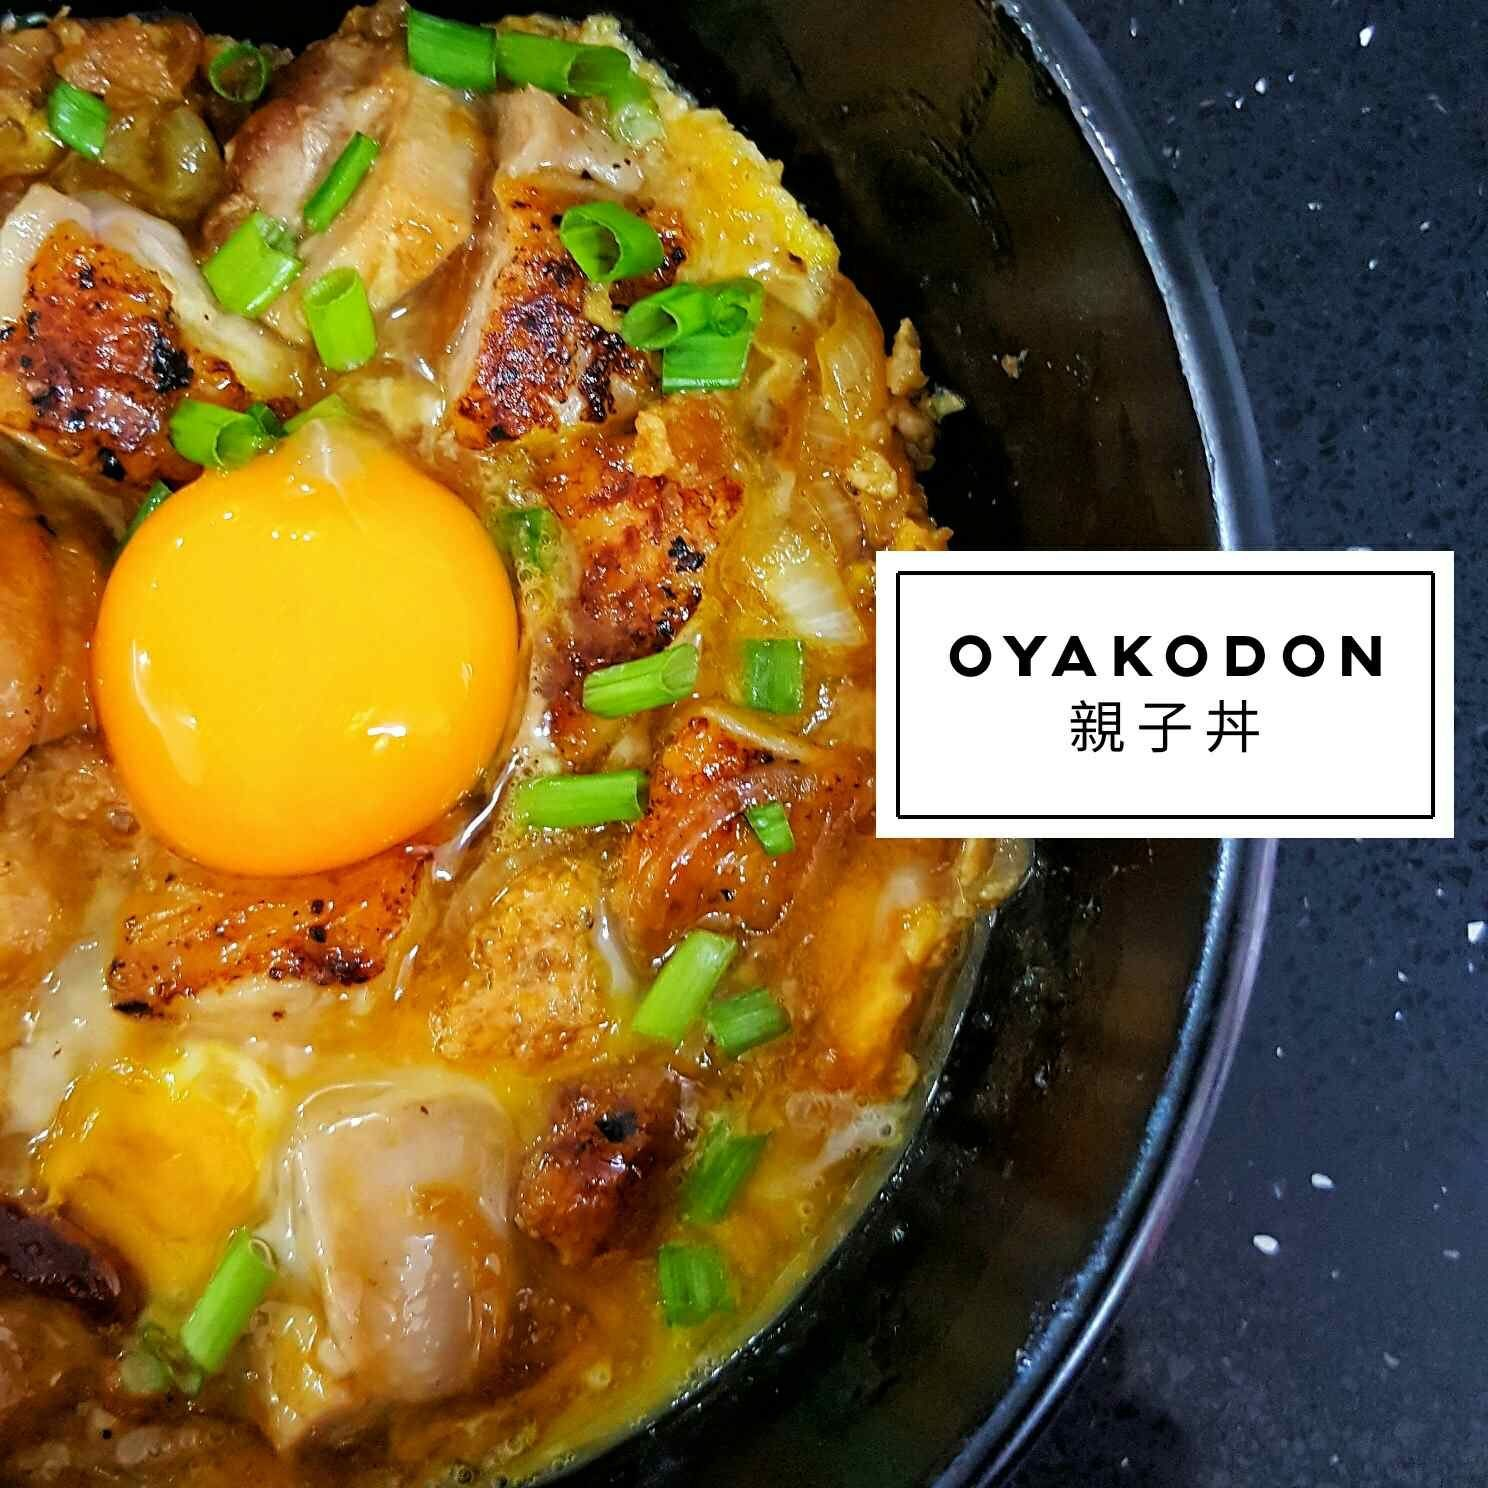 Oyakodon ~ The Authentic Japanese Way